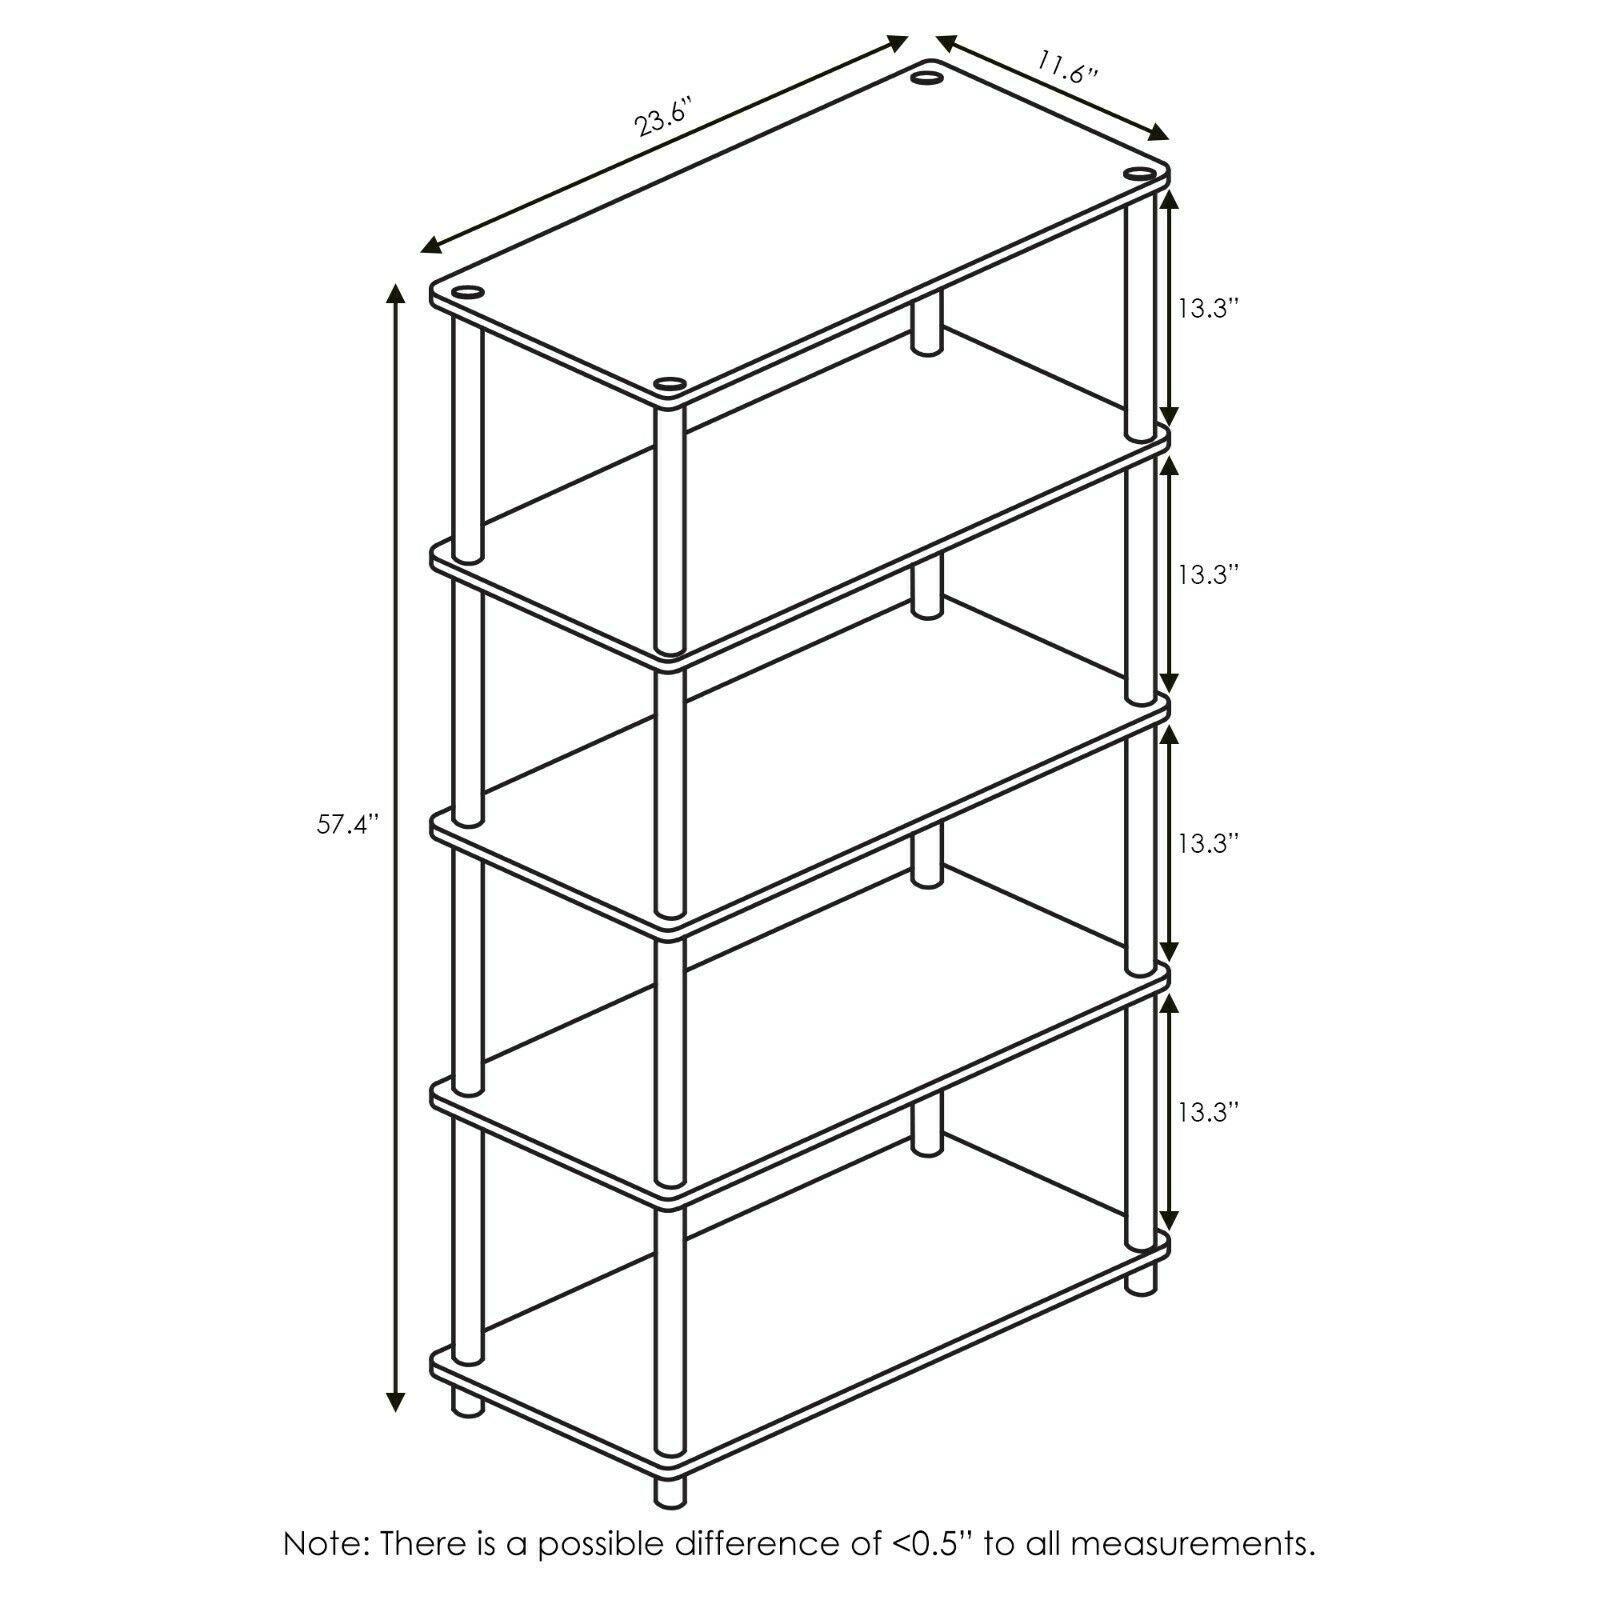 Furinno Turn-N-Tube 5-Tier Multipurpose Shelf Display Rack, Light Cherry/Black